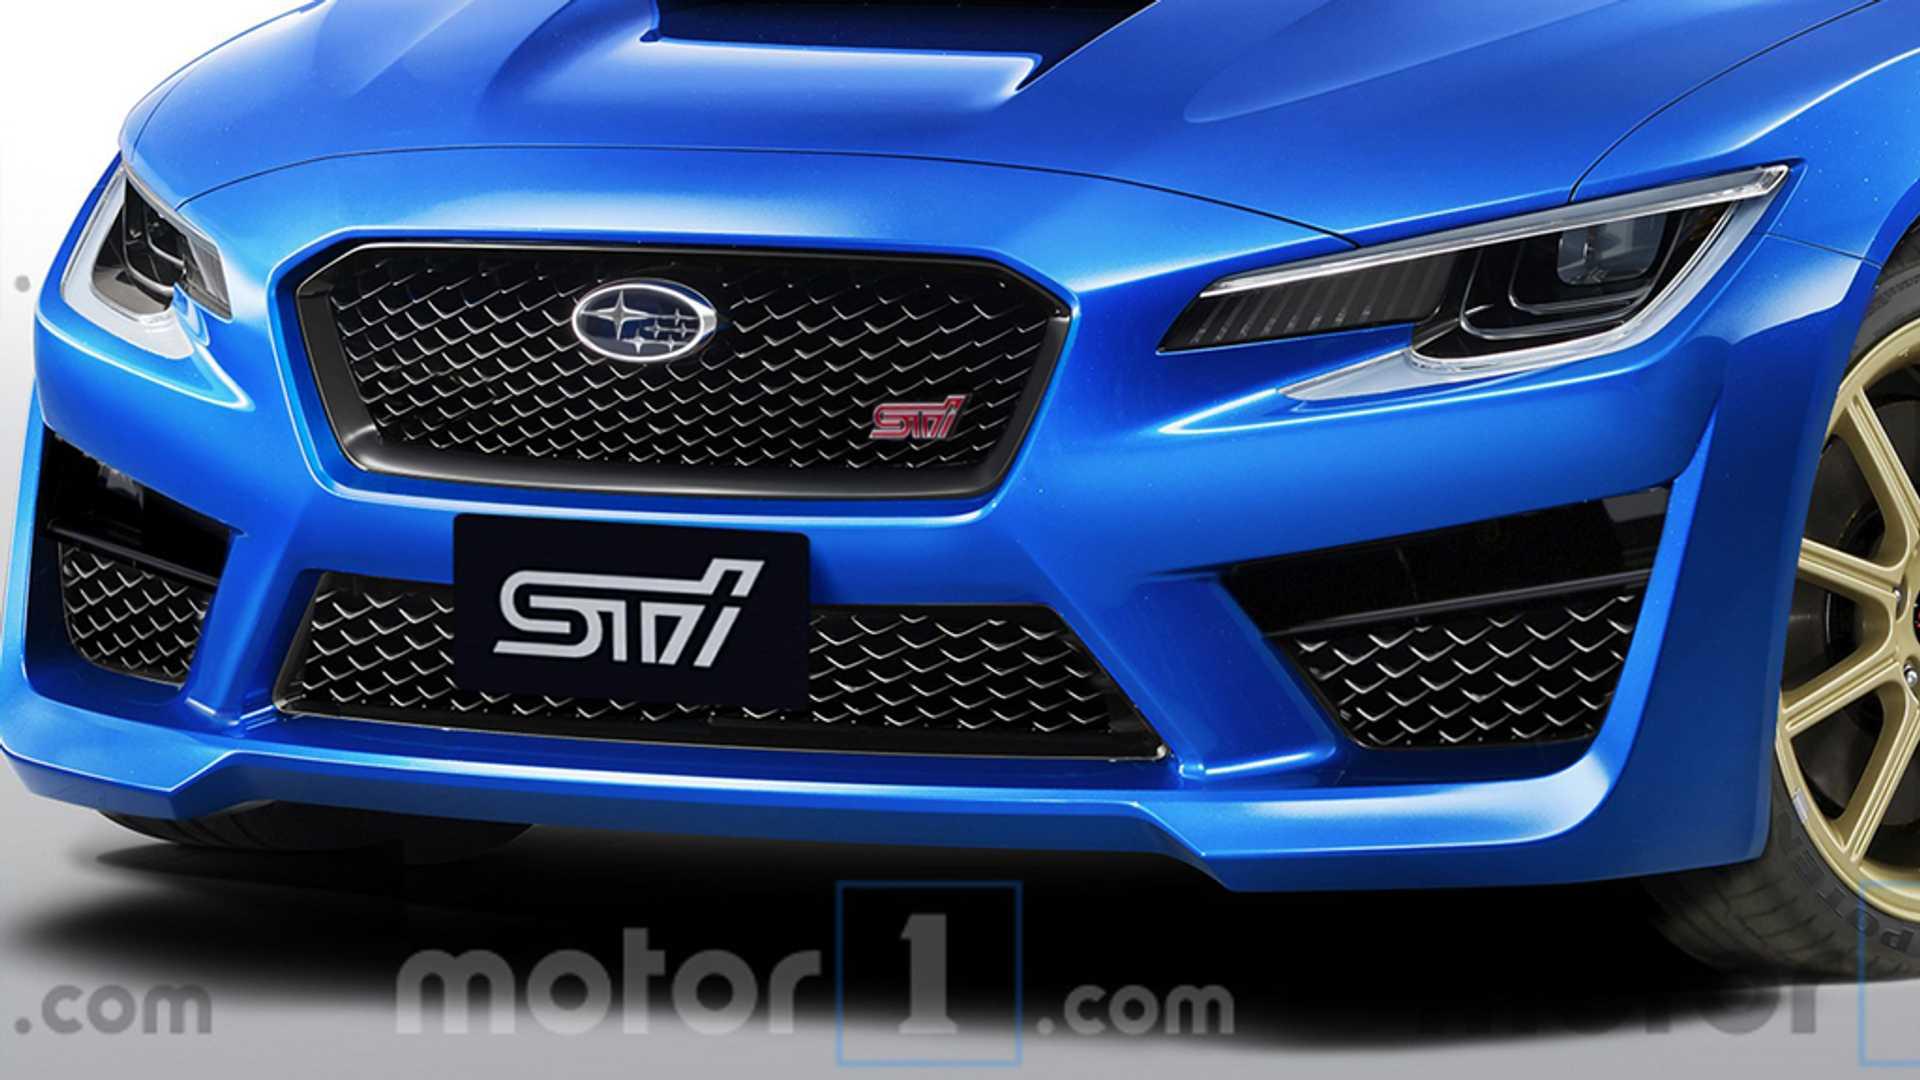 36 All New Subaru Sti Wrx 2020 Spy Shoot for Subaru Sti Wrx 2020